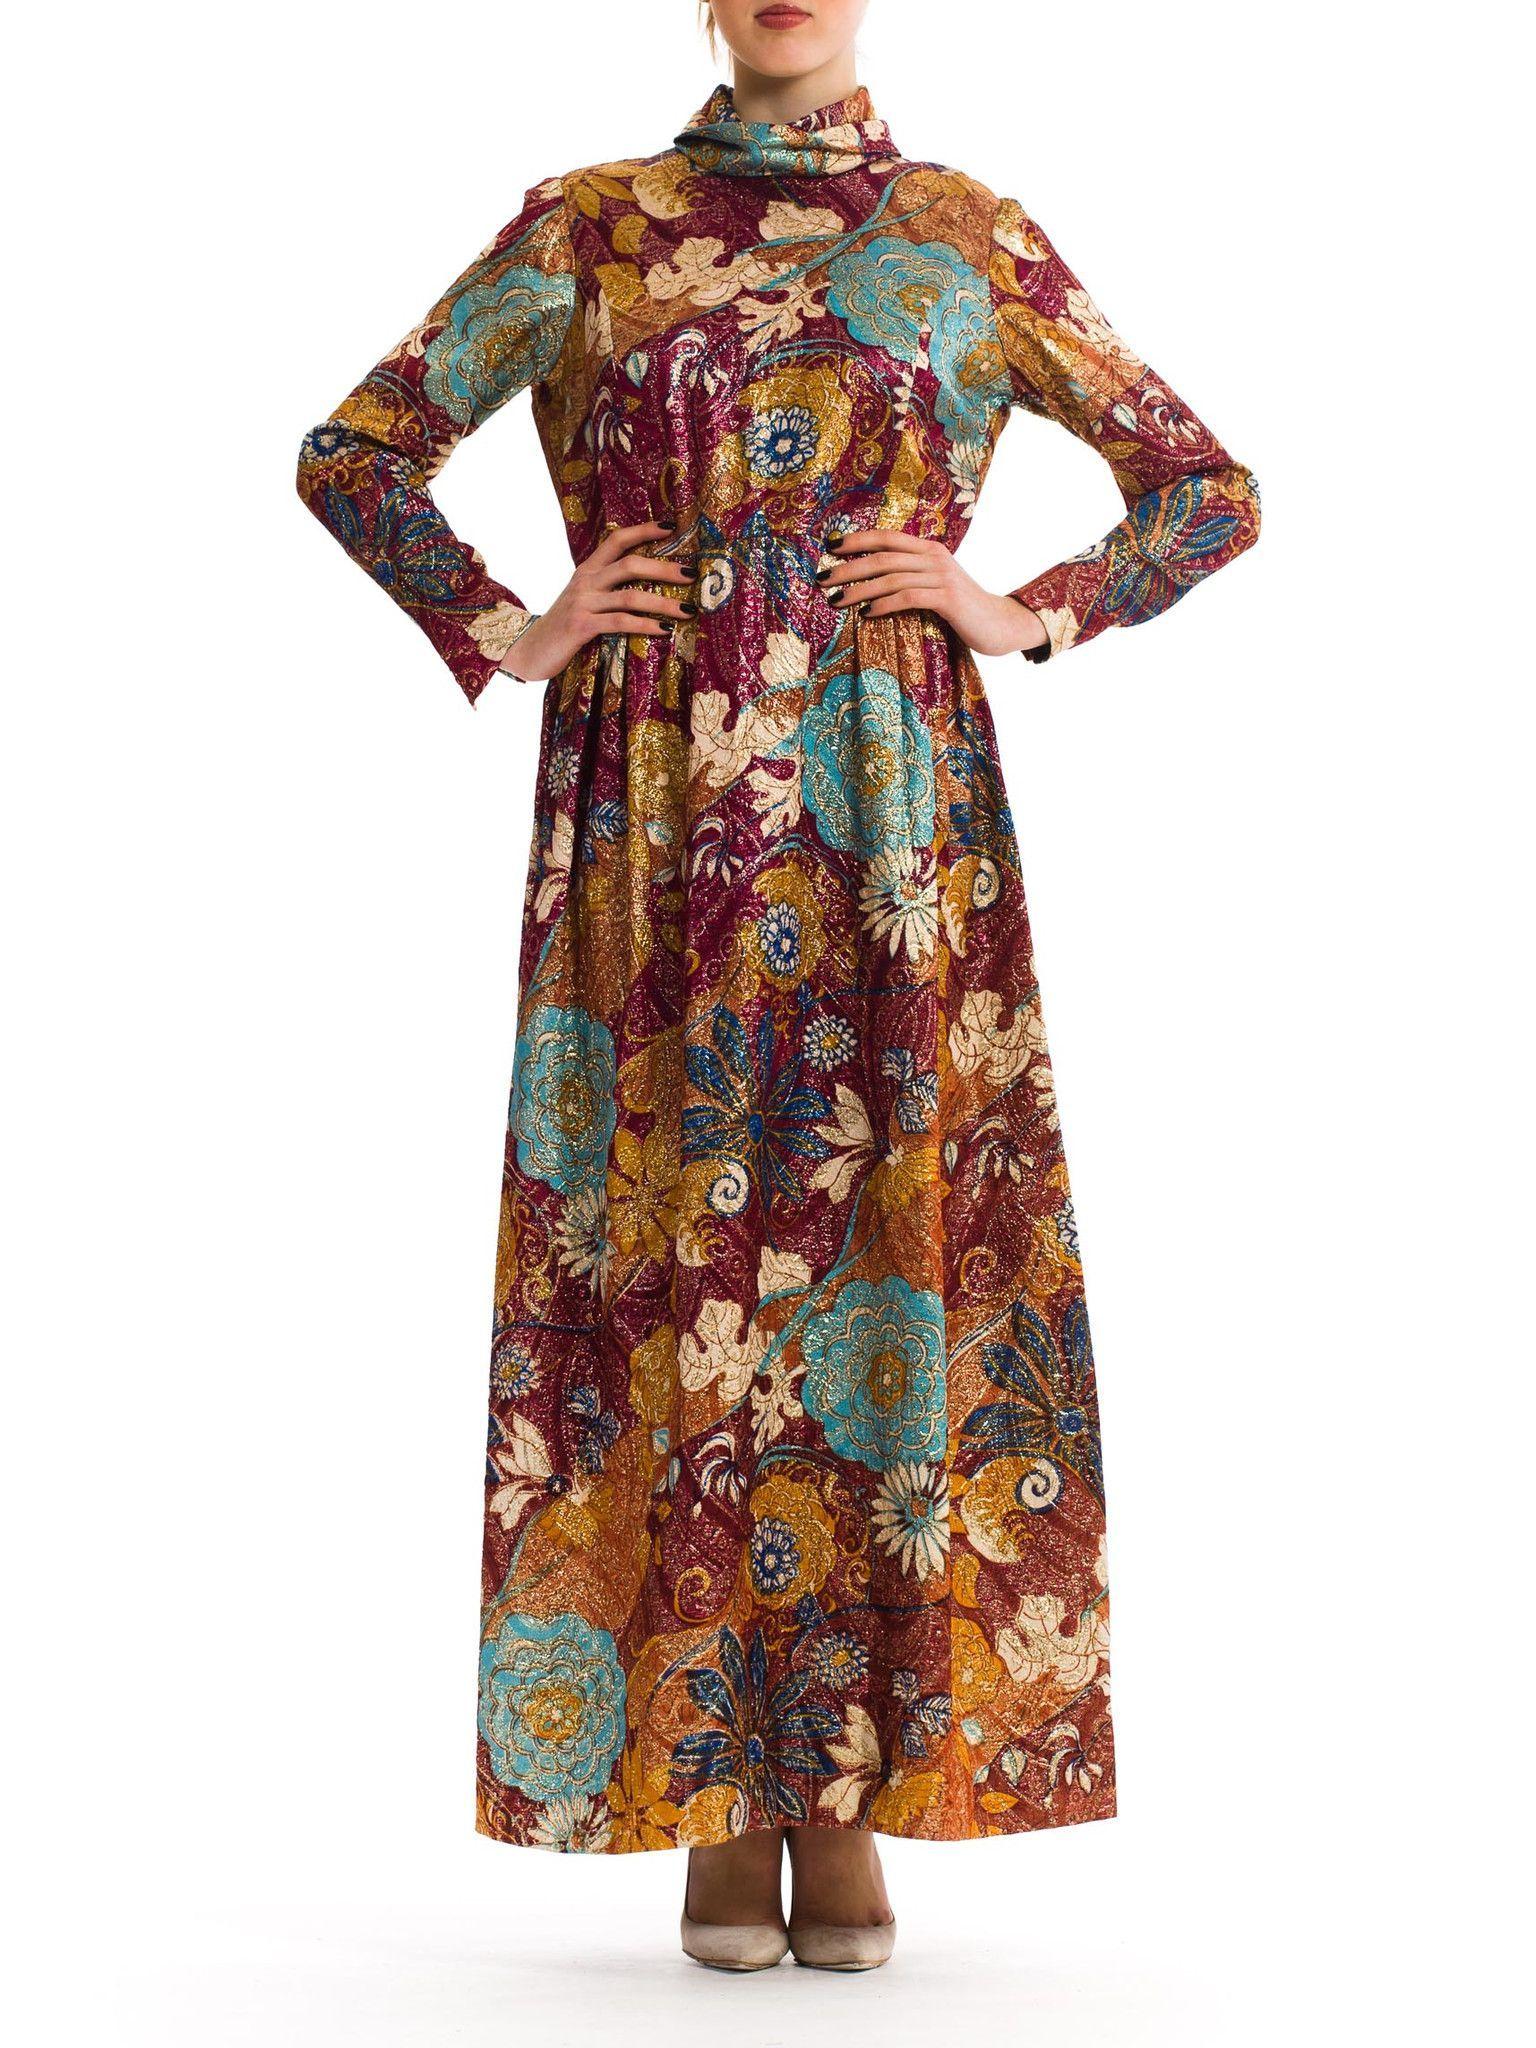 1960s Vintage Metallic Floral Print Dress